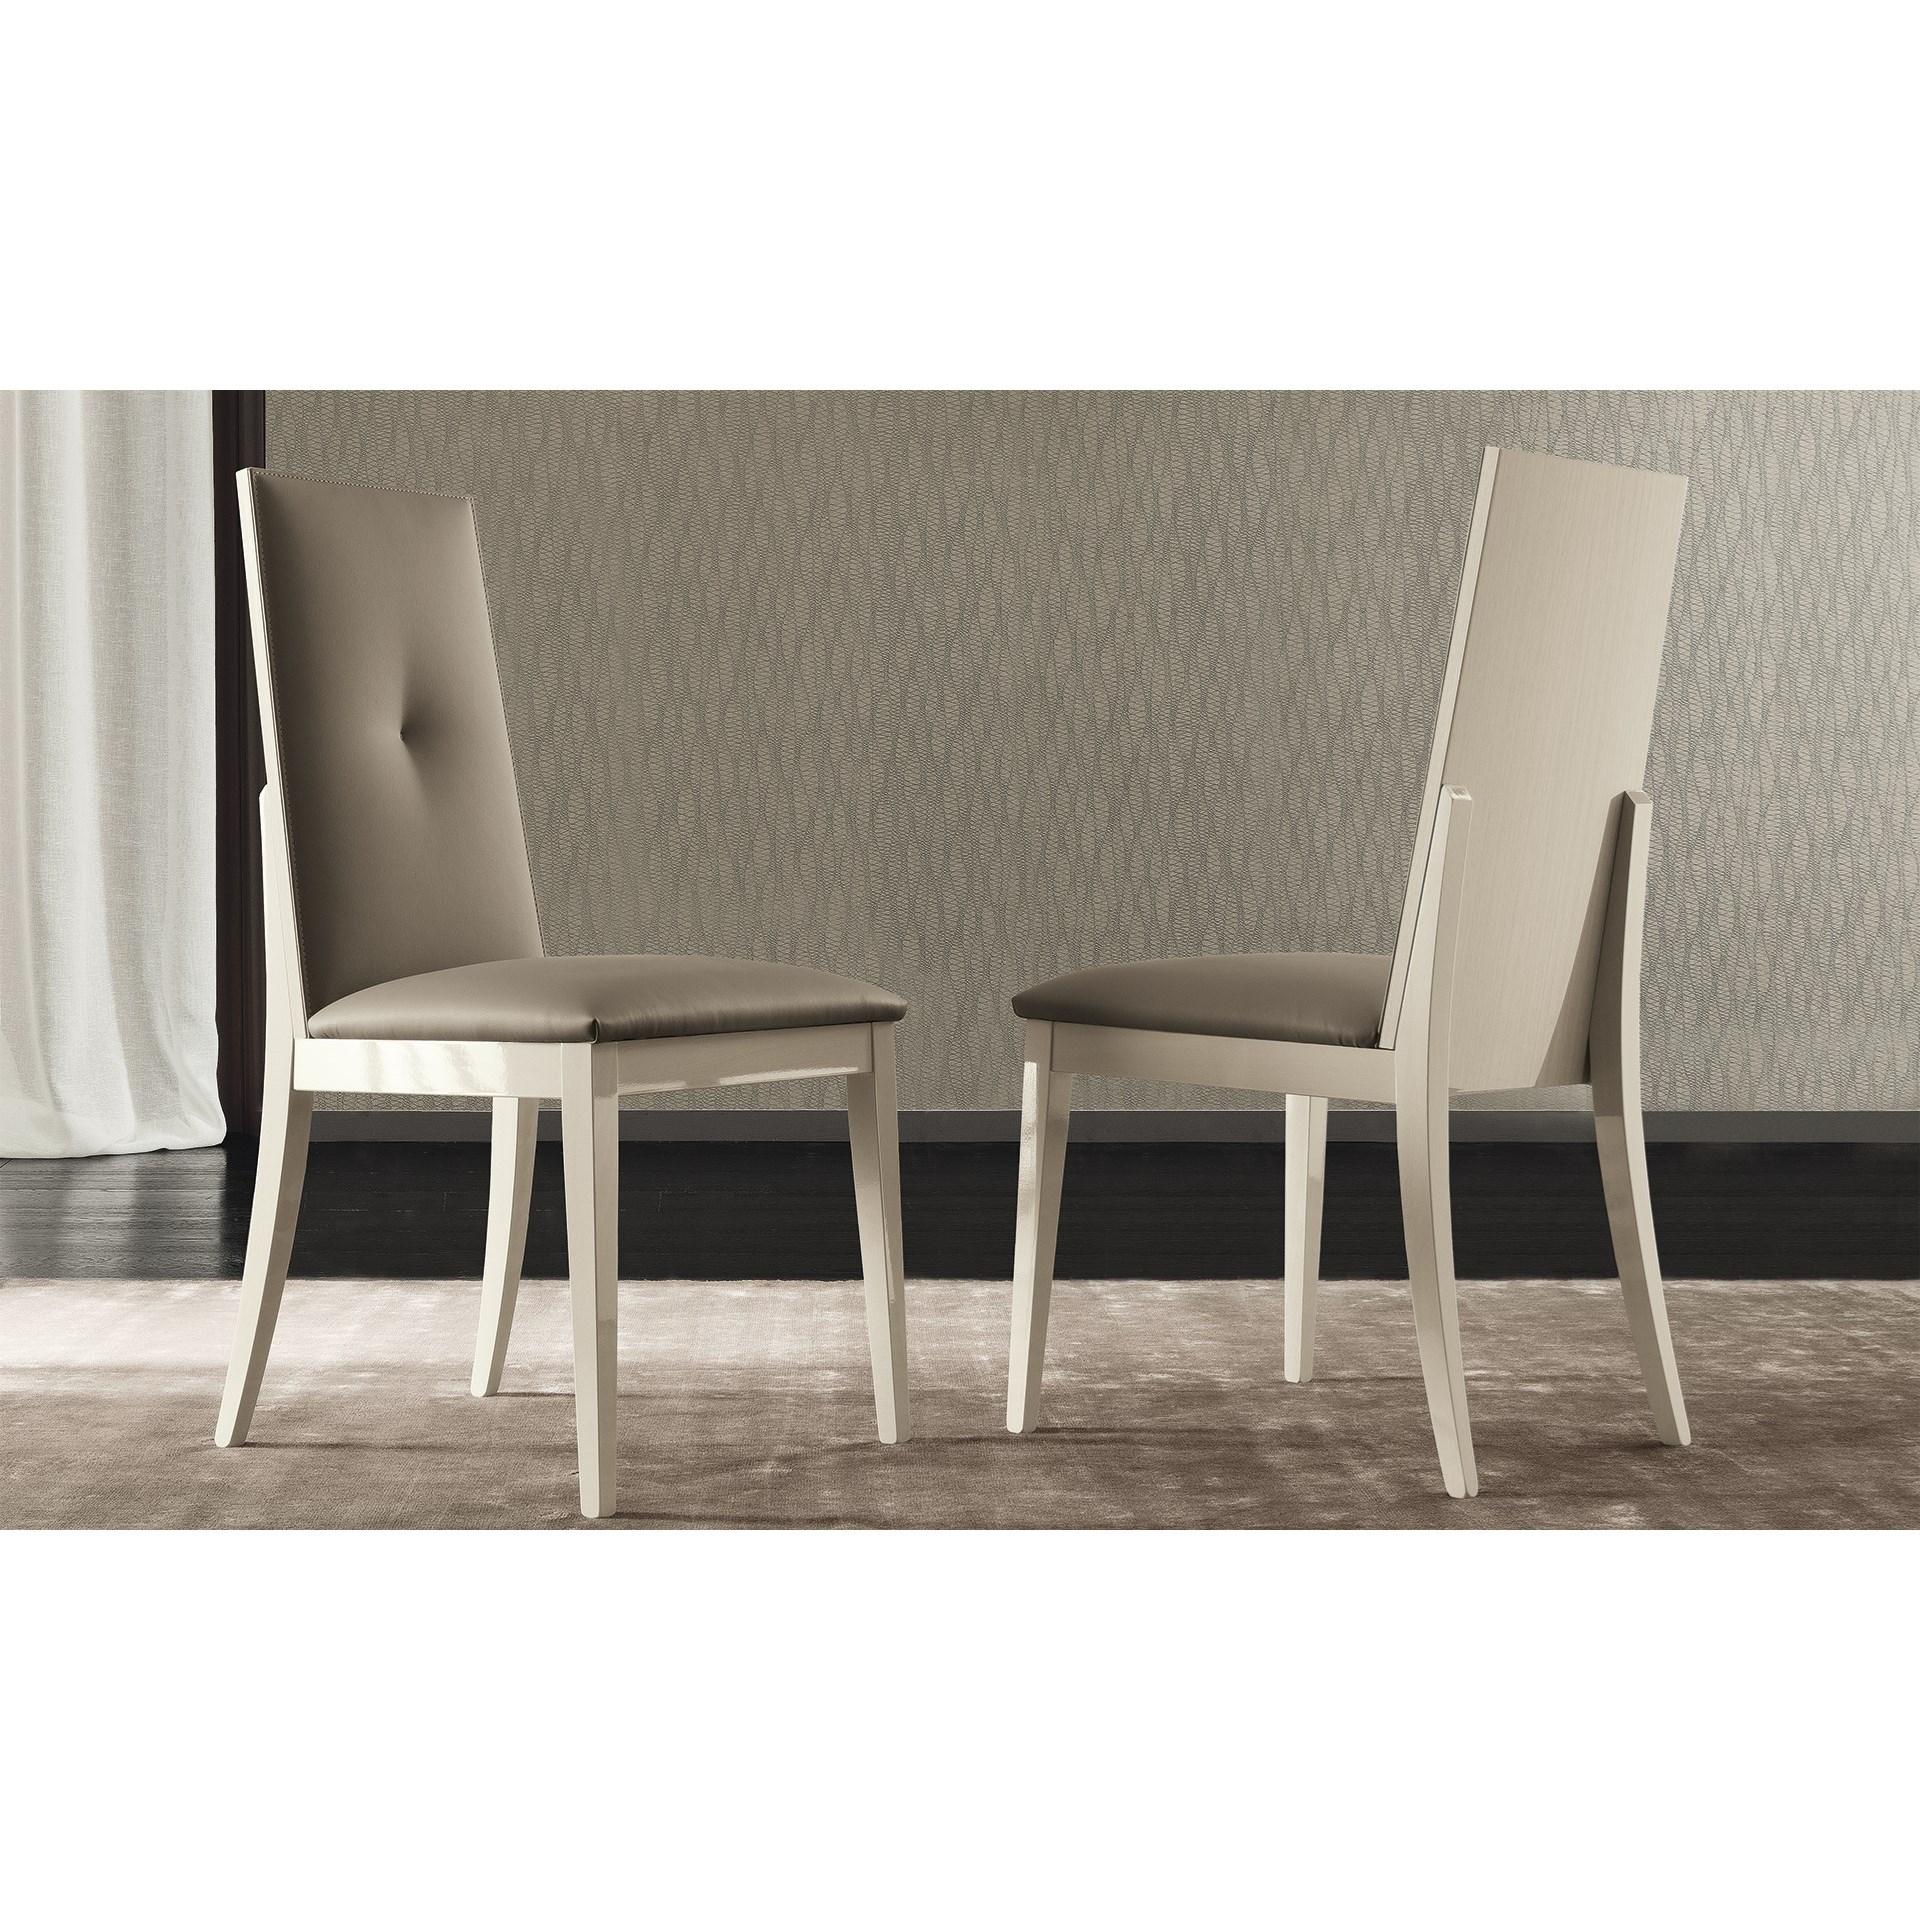 Montechiaro Chair